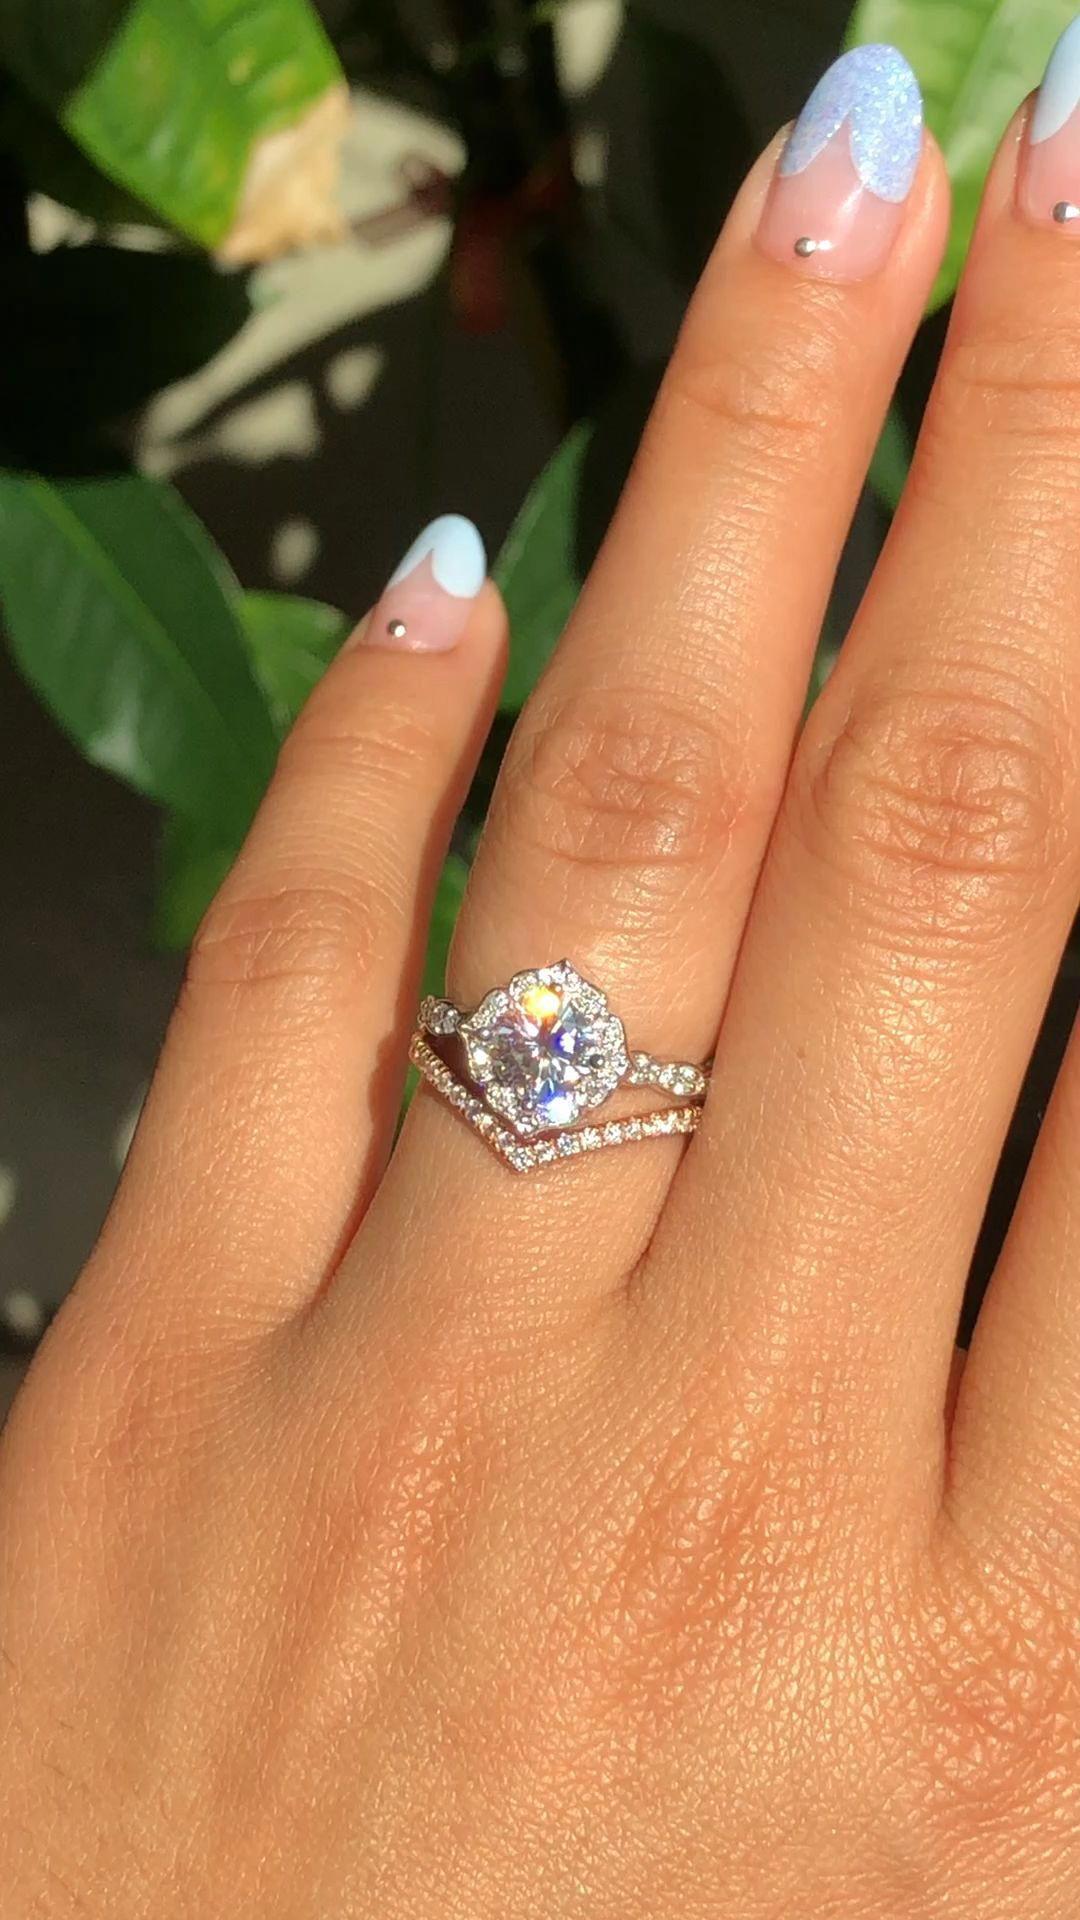 Moissanite engagement ring 14k rose gold diamond wedding band bridal ring 7mm cushion Forever ...